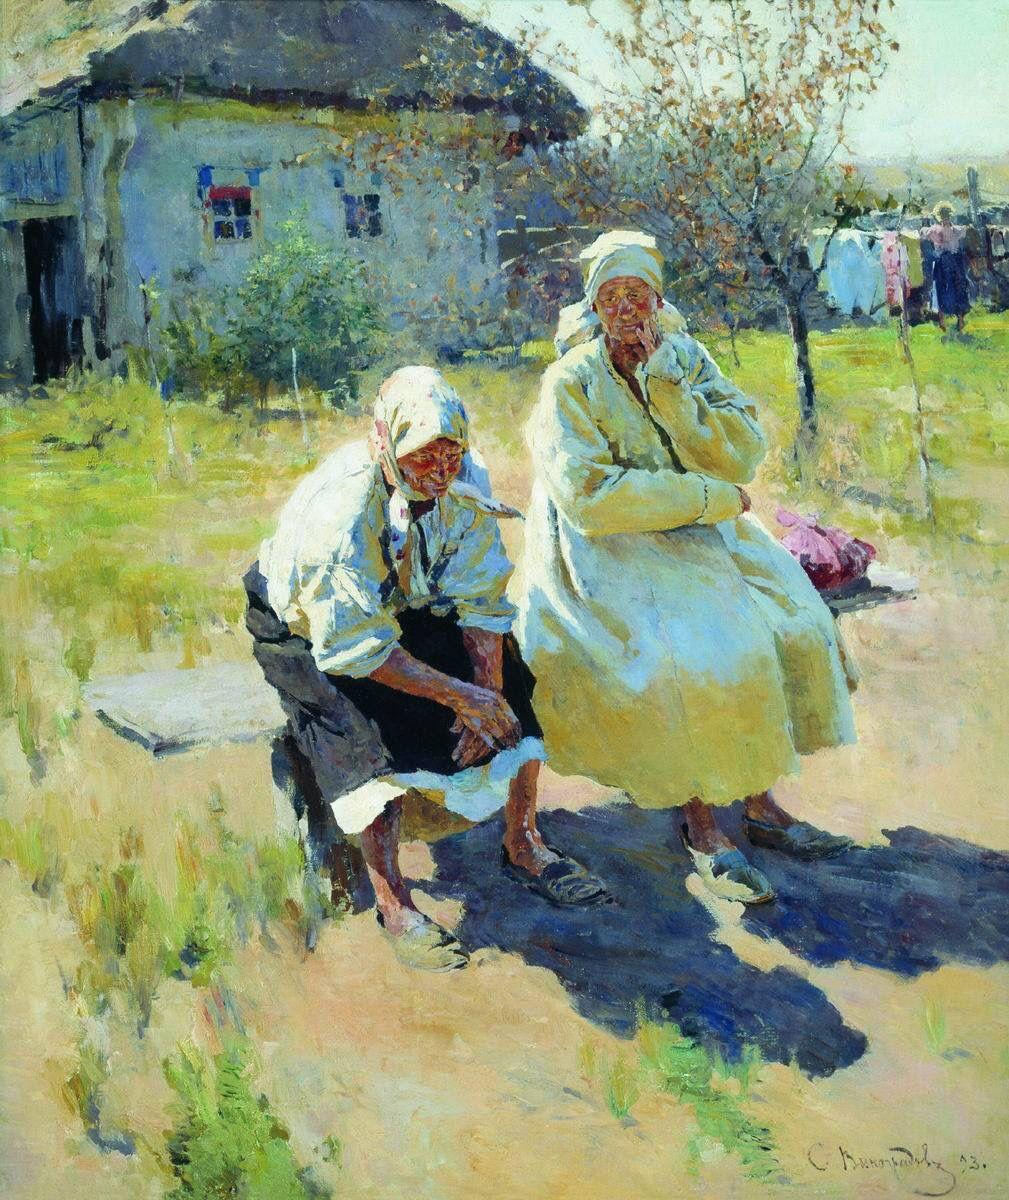 Painting by Sergei Vinogradov (1869-1938) Russian Artist. | Russian  painting, Russian impressionism, Art painting